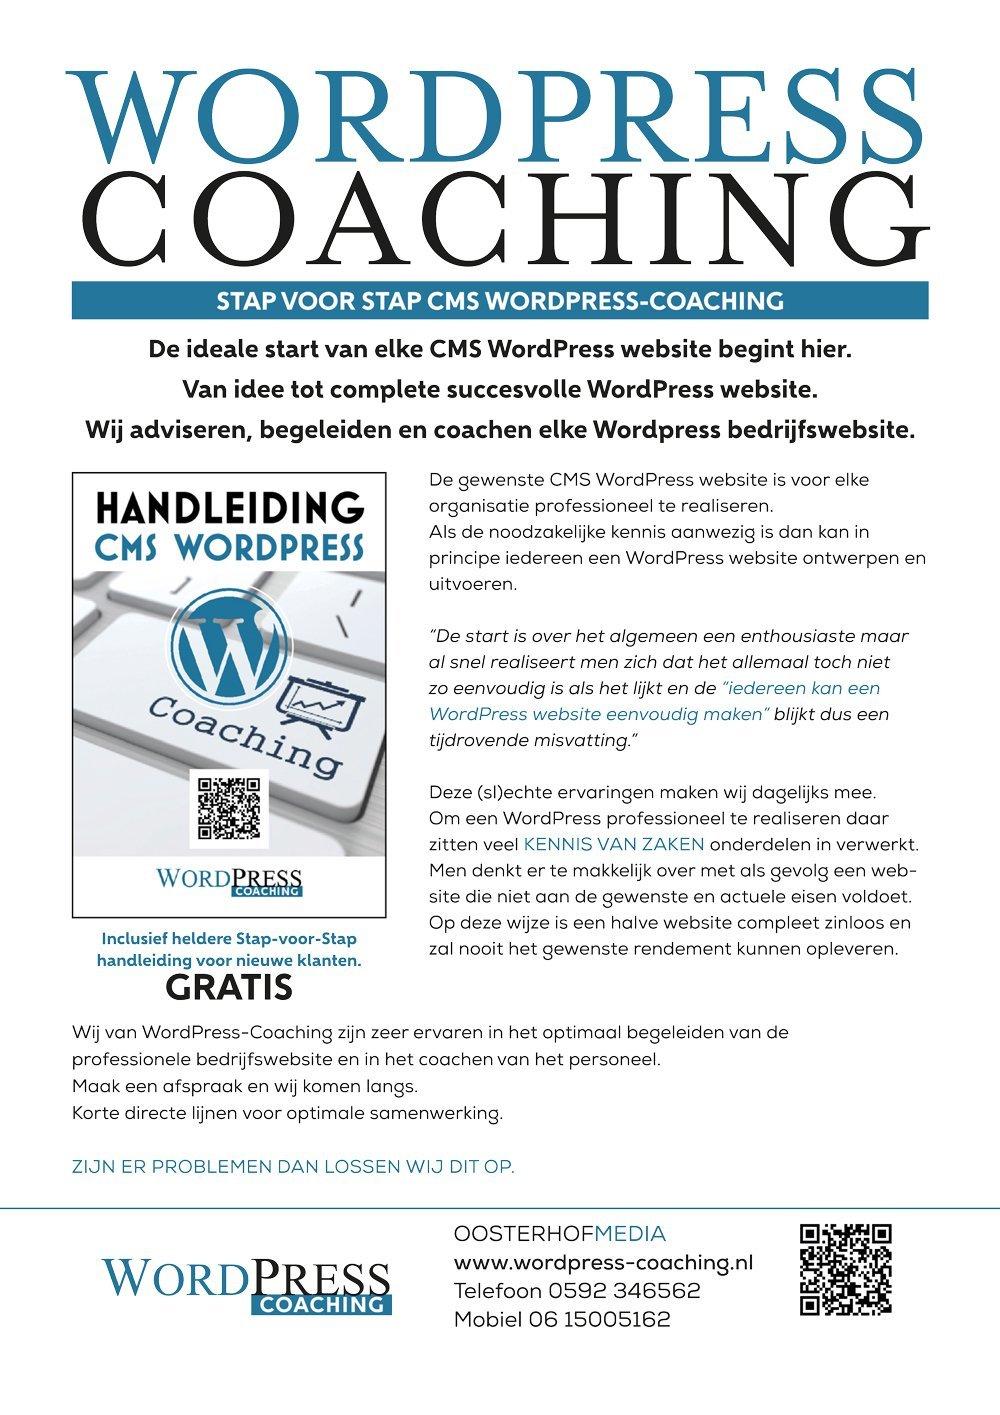 Wordpress-Coaching-WORPRESS-HANDLEIDING-FLYER-JUNi2019-1000x1415.jpg